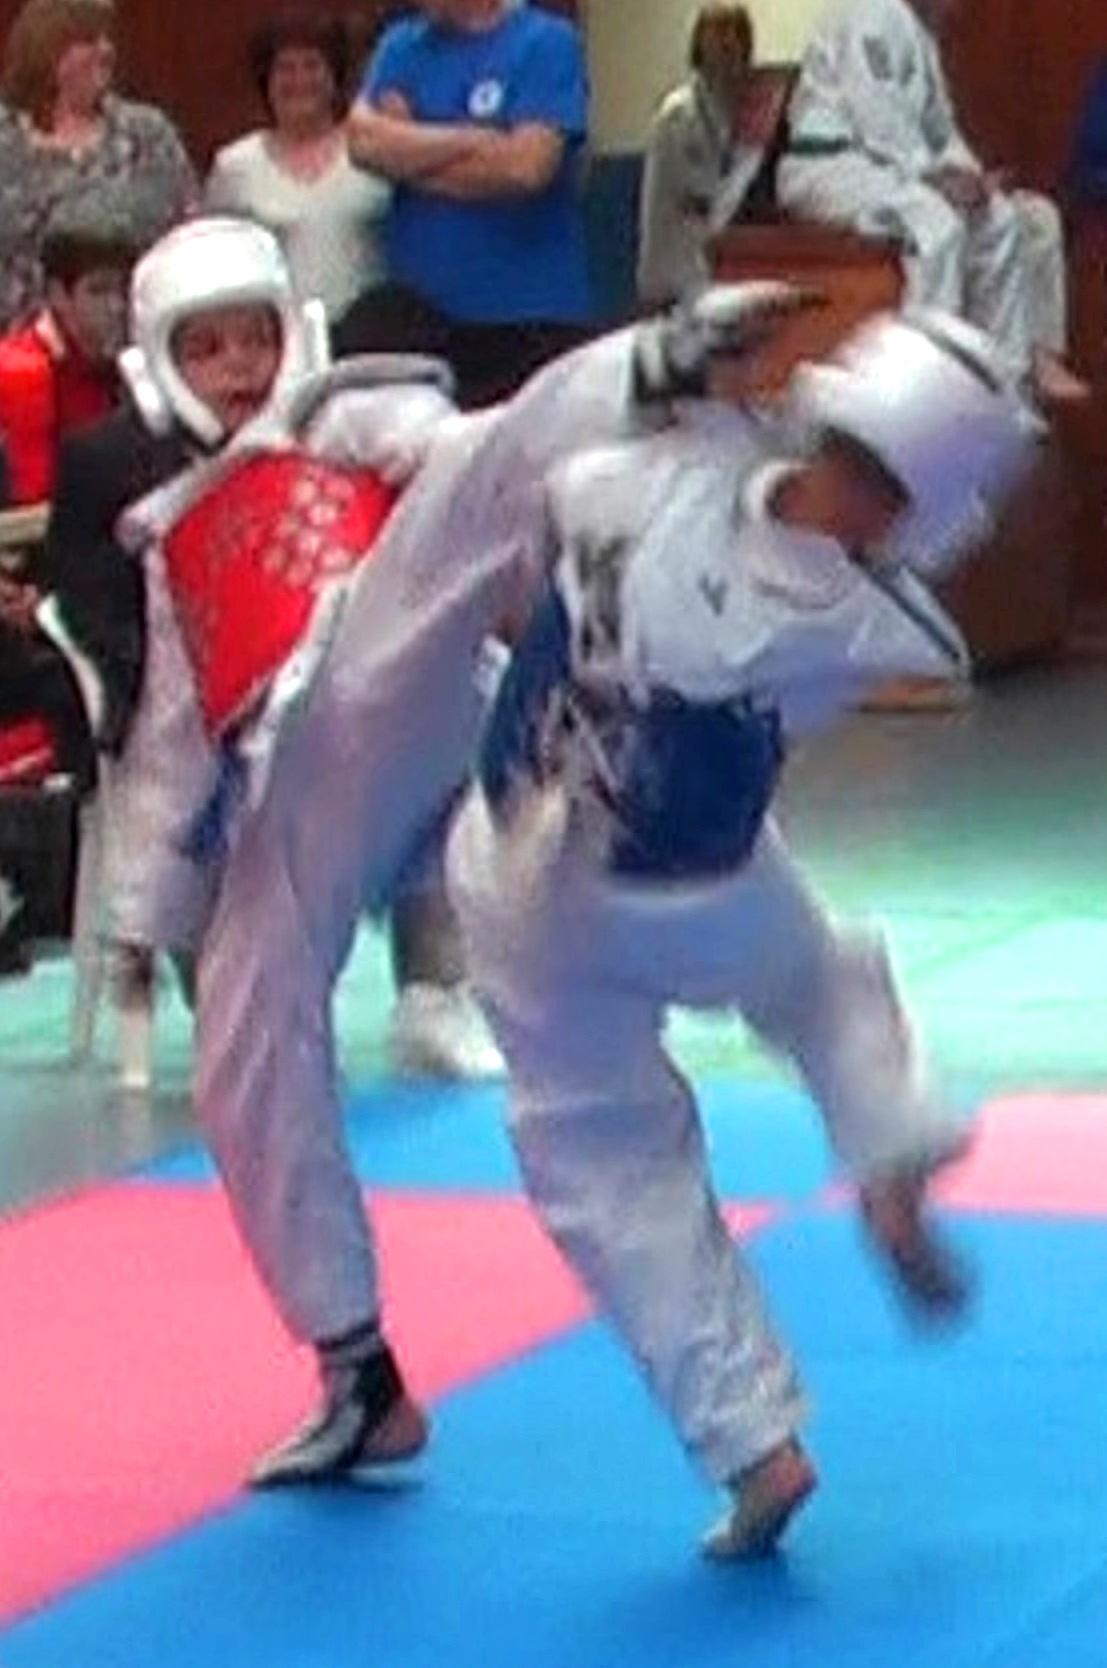 19 Medaillen beim Hessenpokal – SPORTING Taekwondo zeigt Klasse!